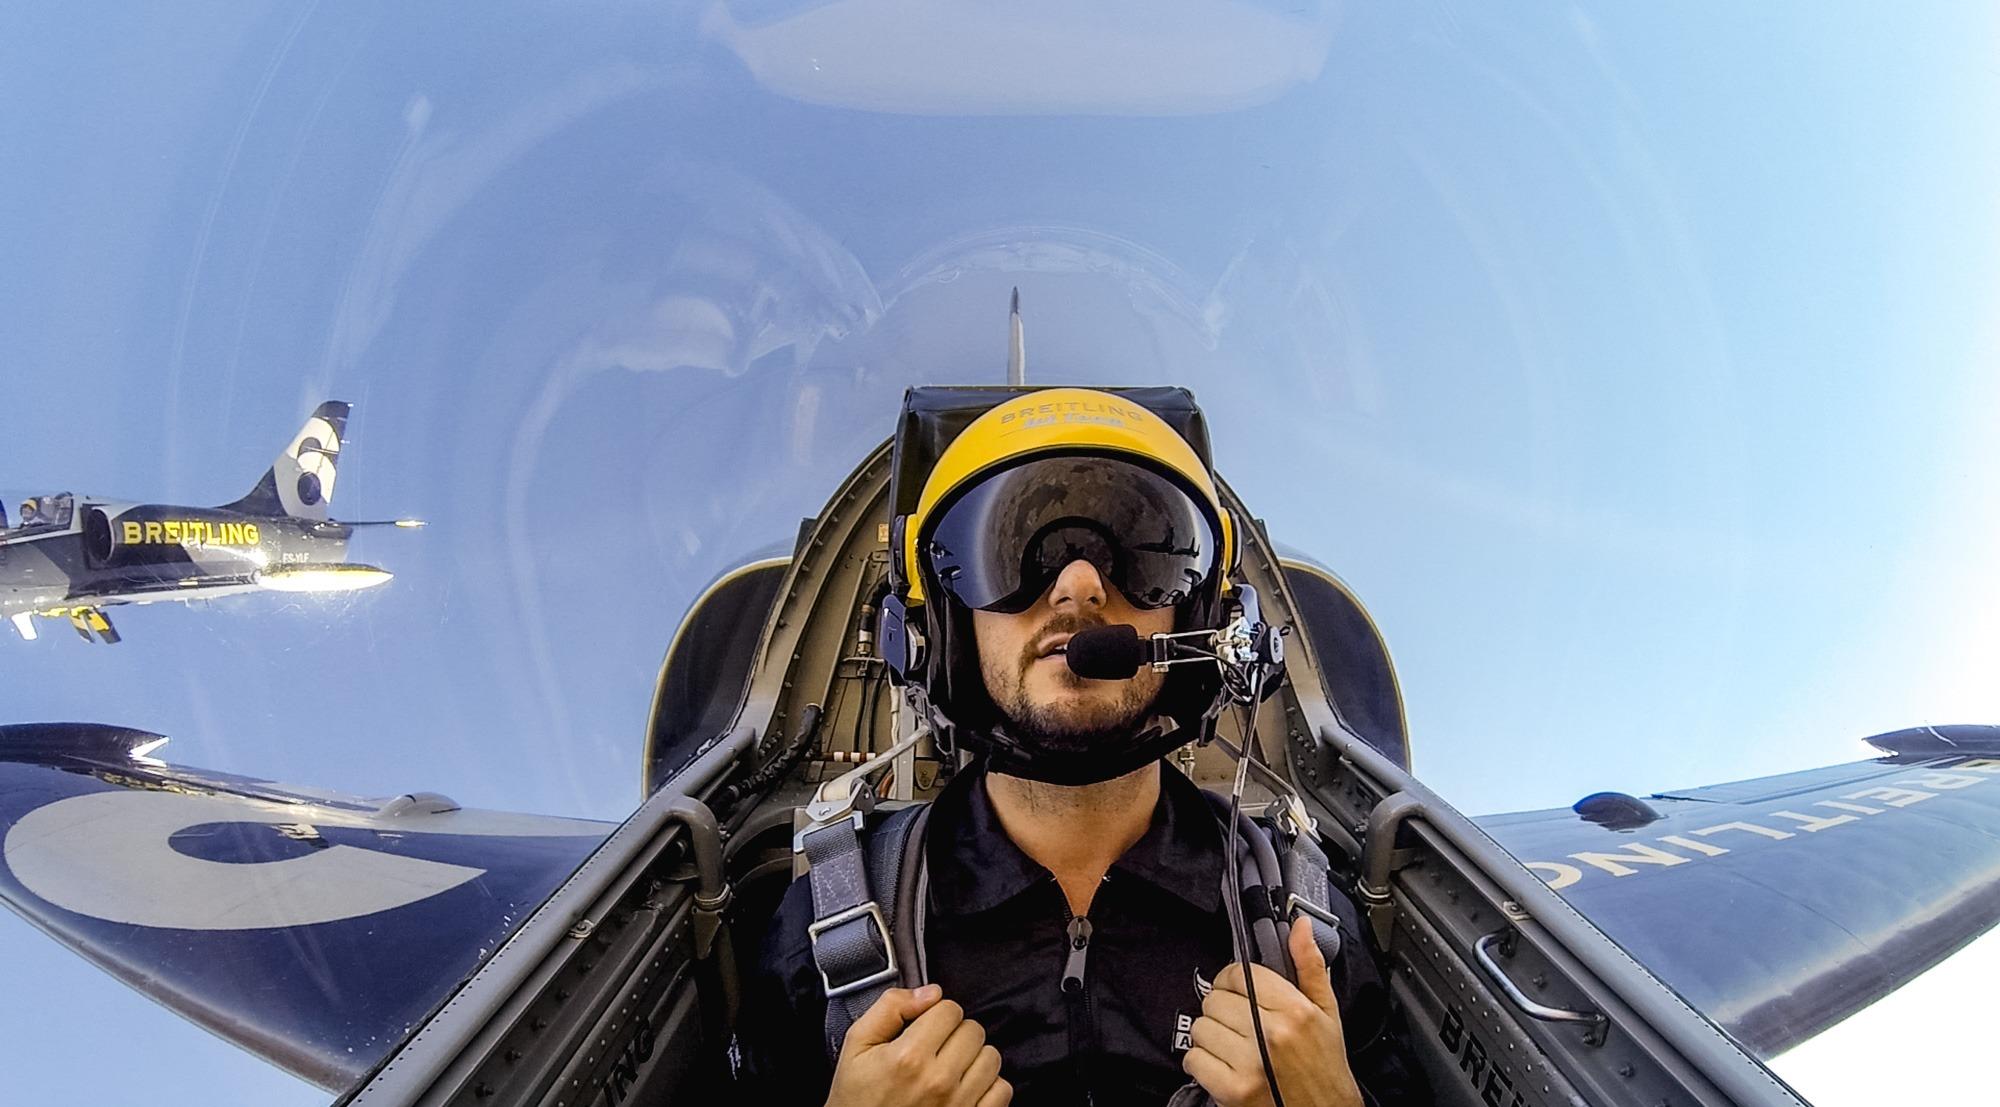 Breitling Jet Team - Vol